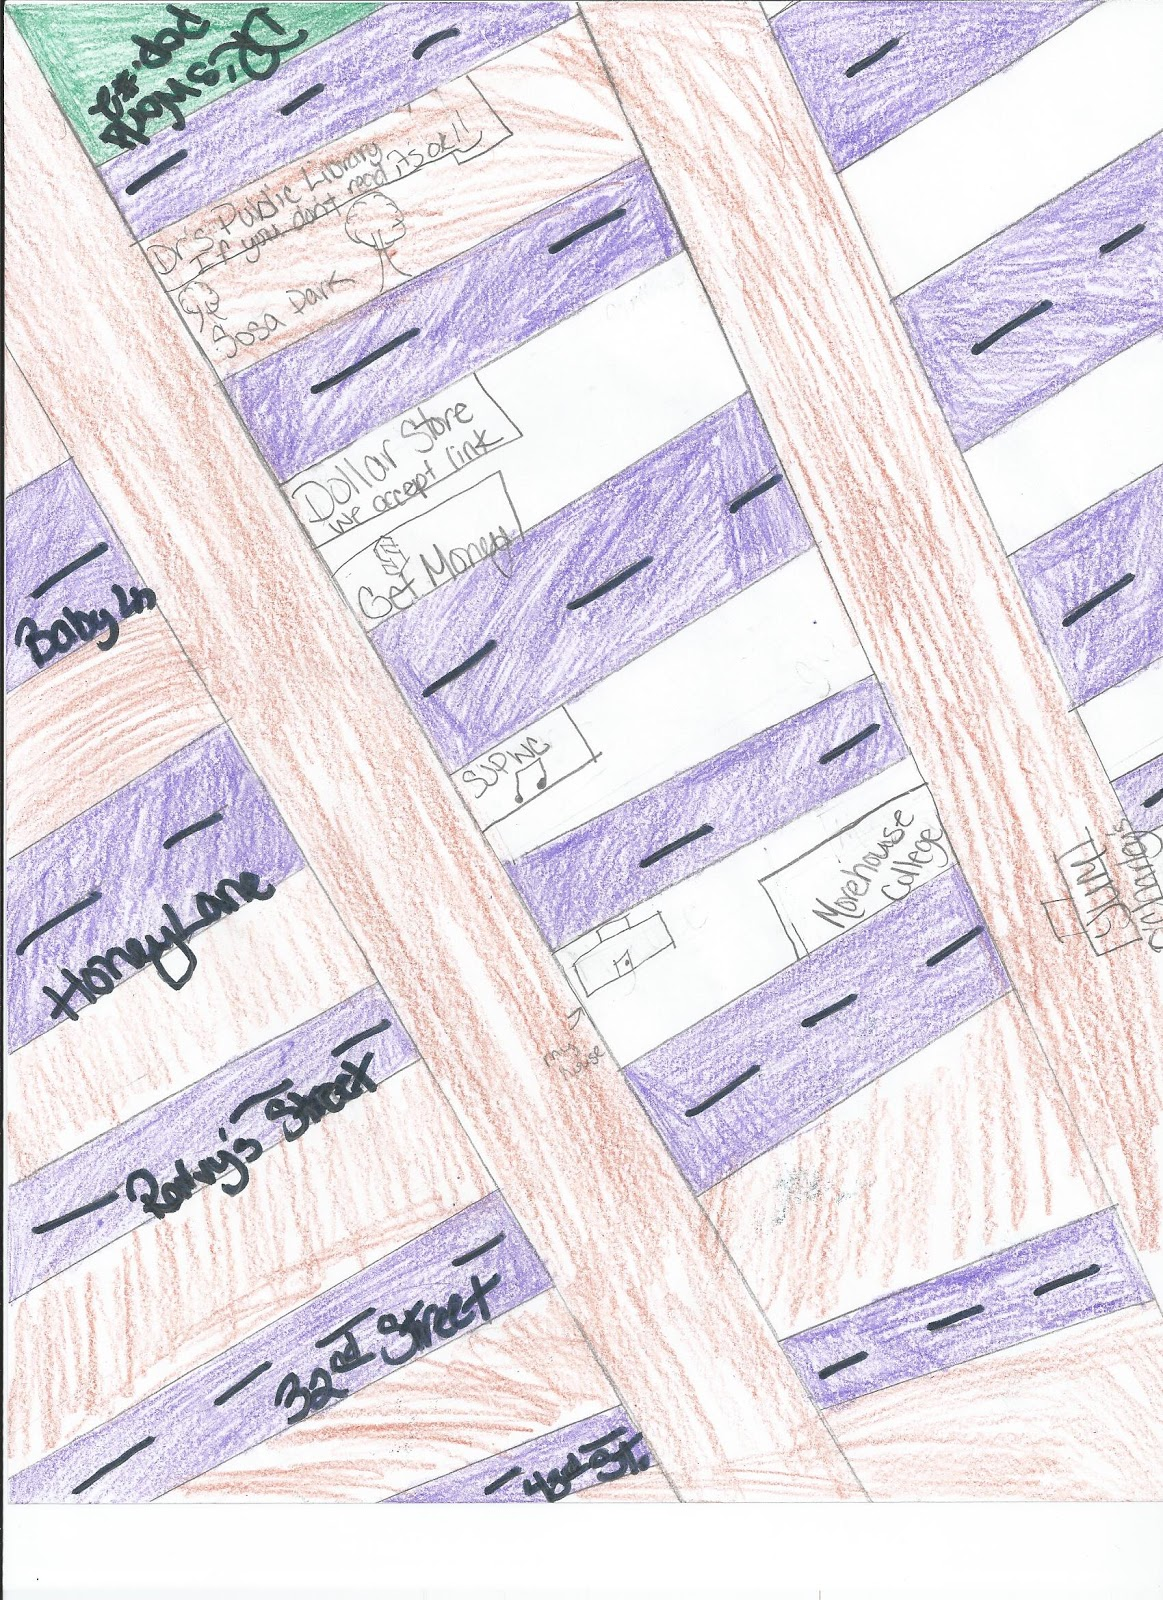 Geometry Line Design Project : Misscalcul made math city design project